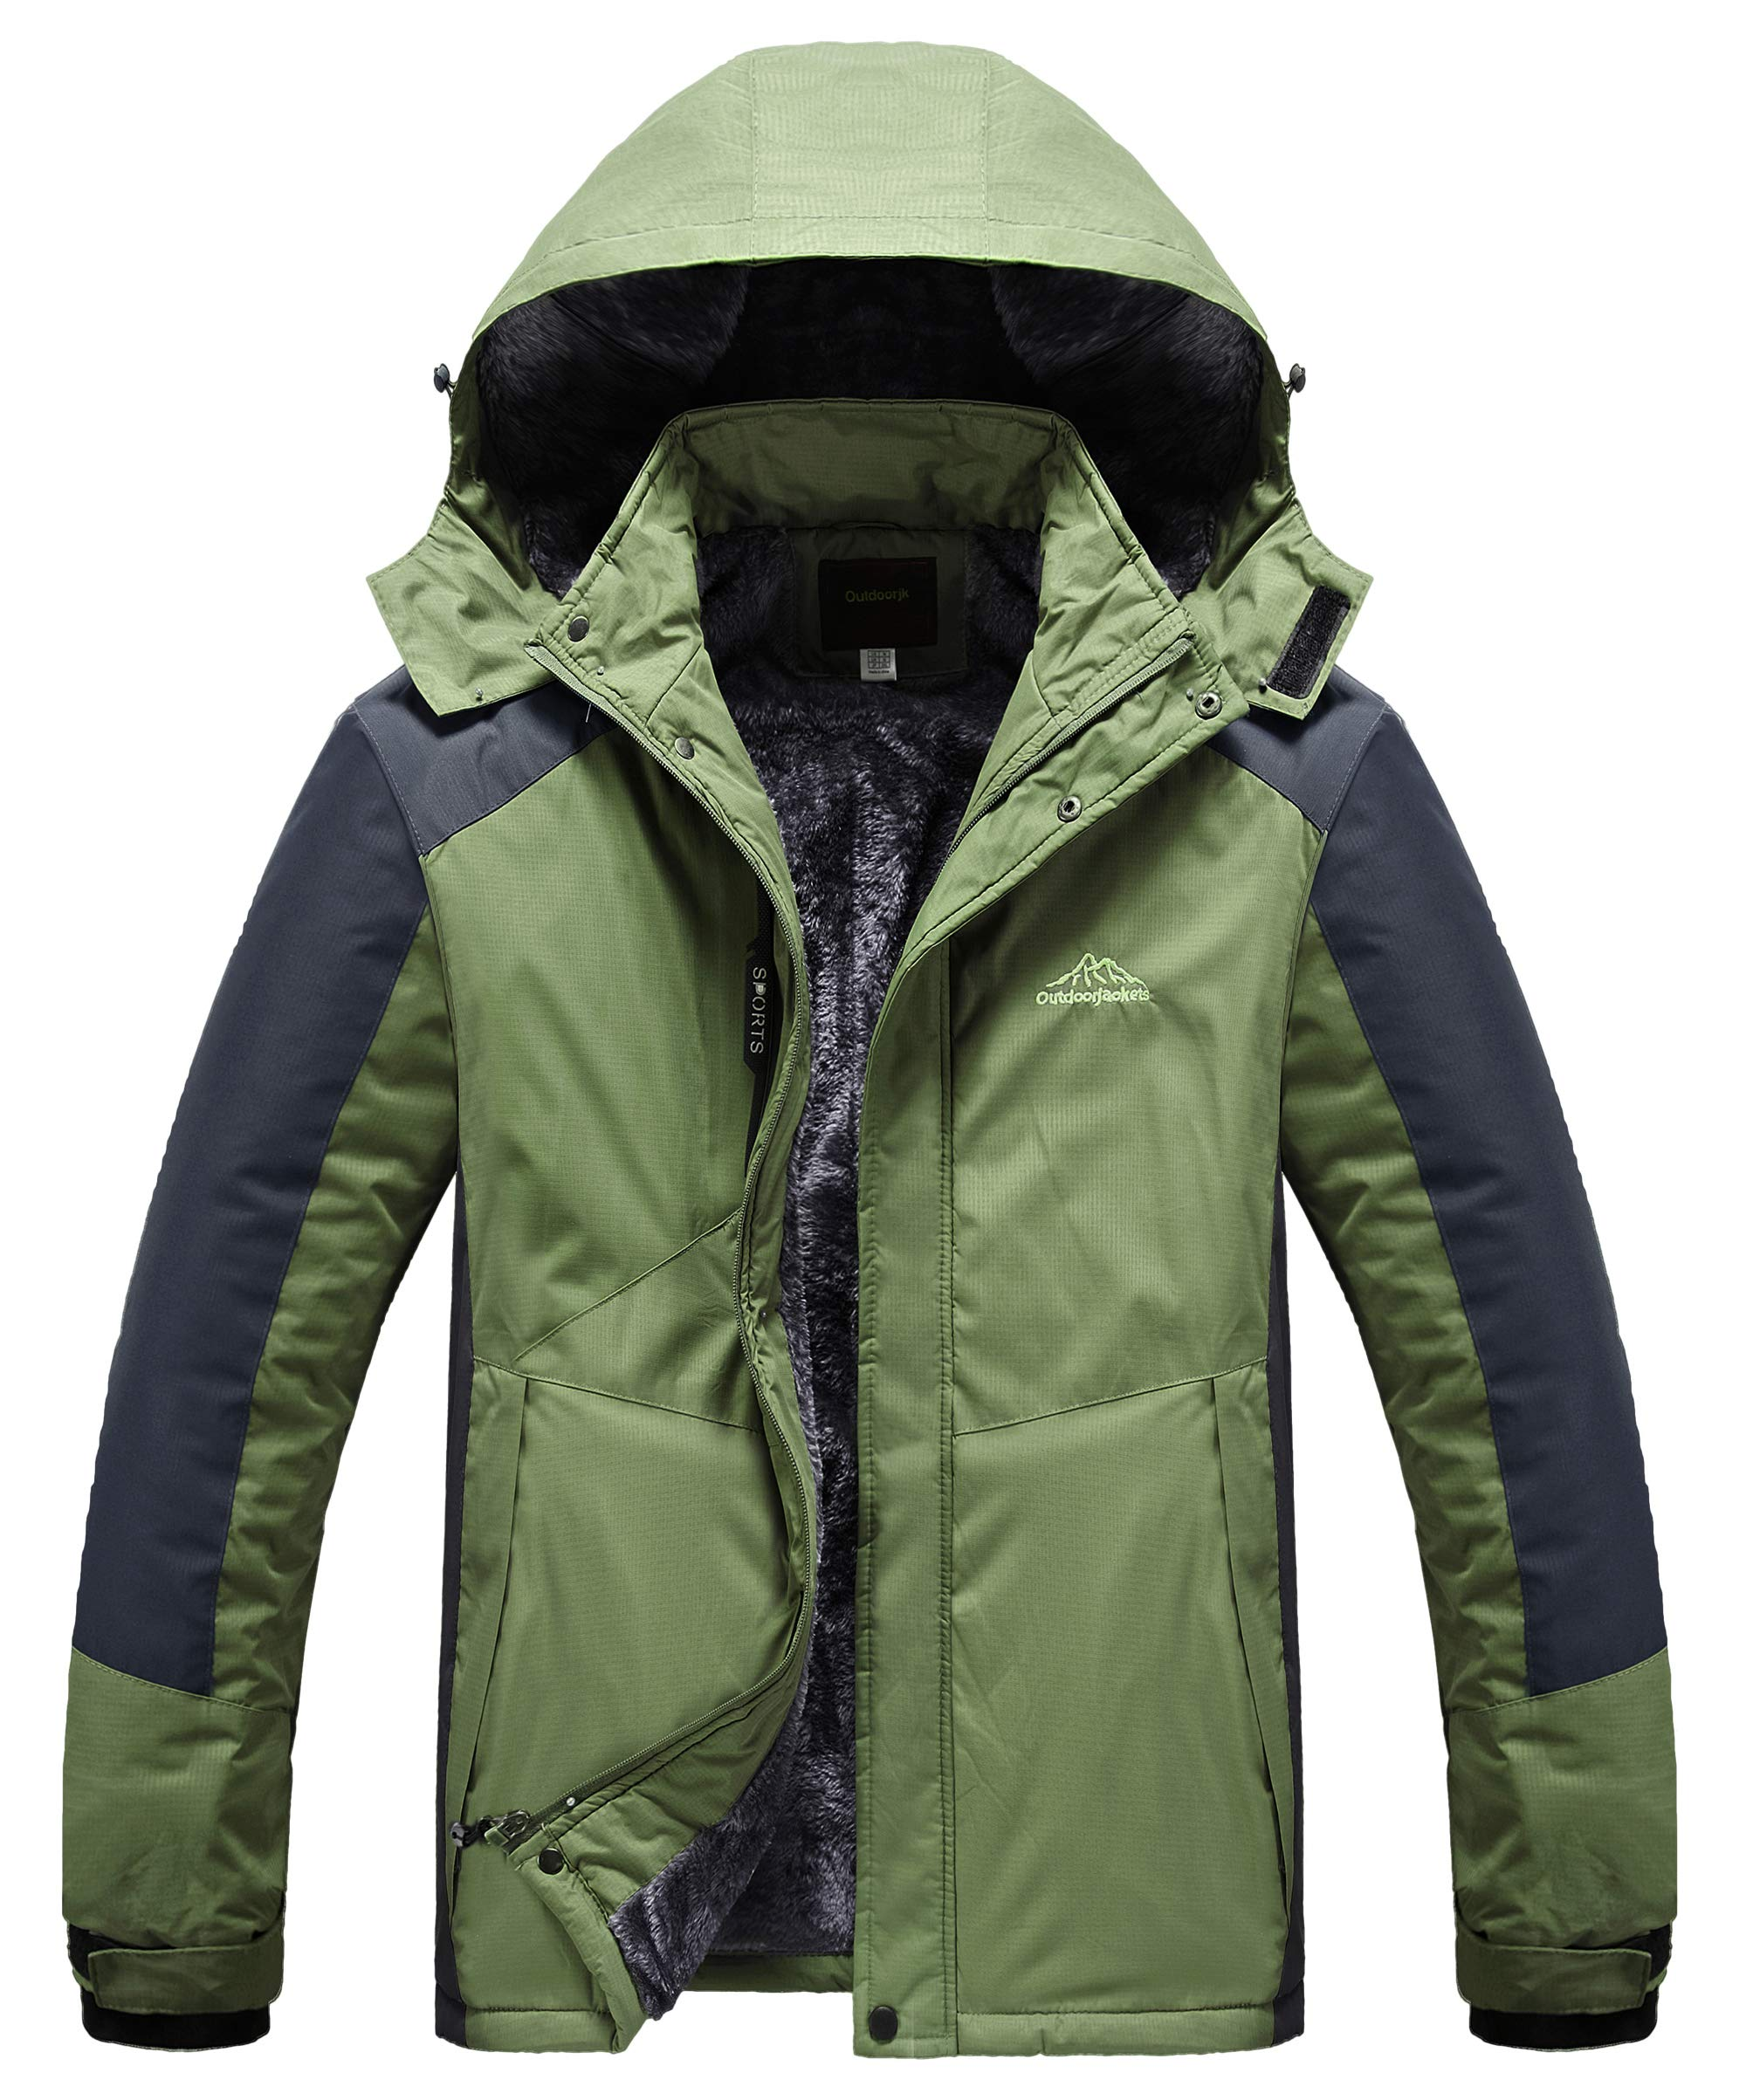 Heihuohua Men s Winter Snowboard Jacket Waterproof Fleece Lined Hiking Coat  product image f7ce88581